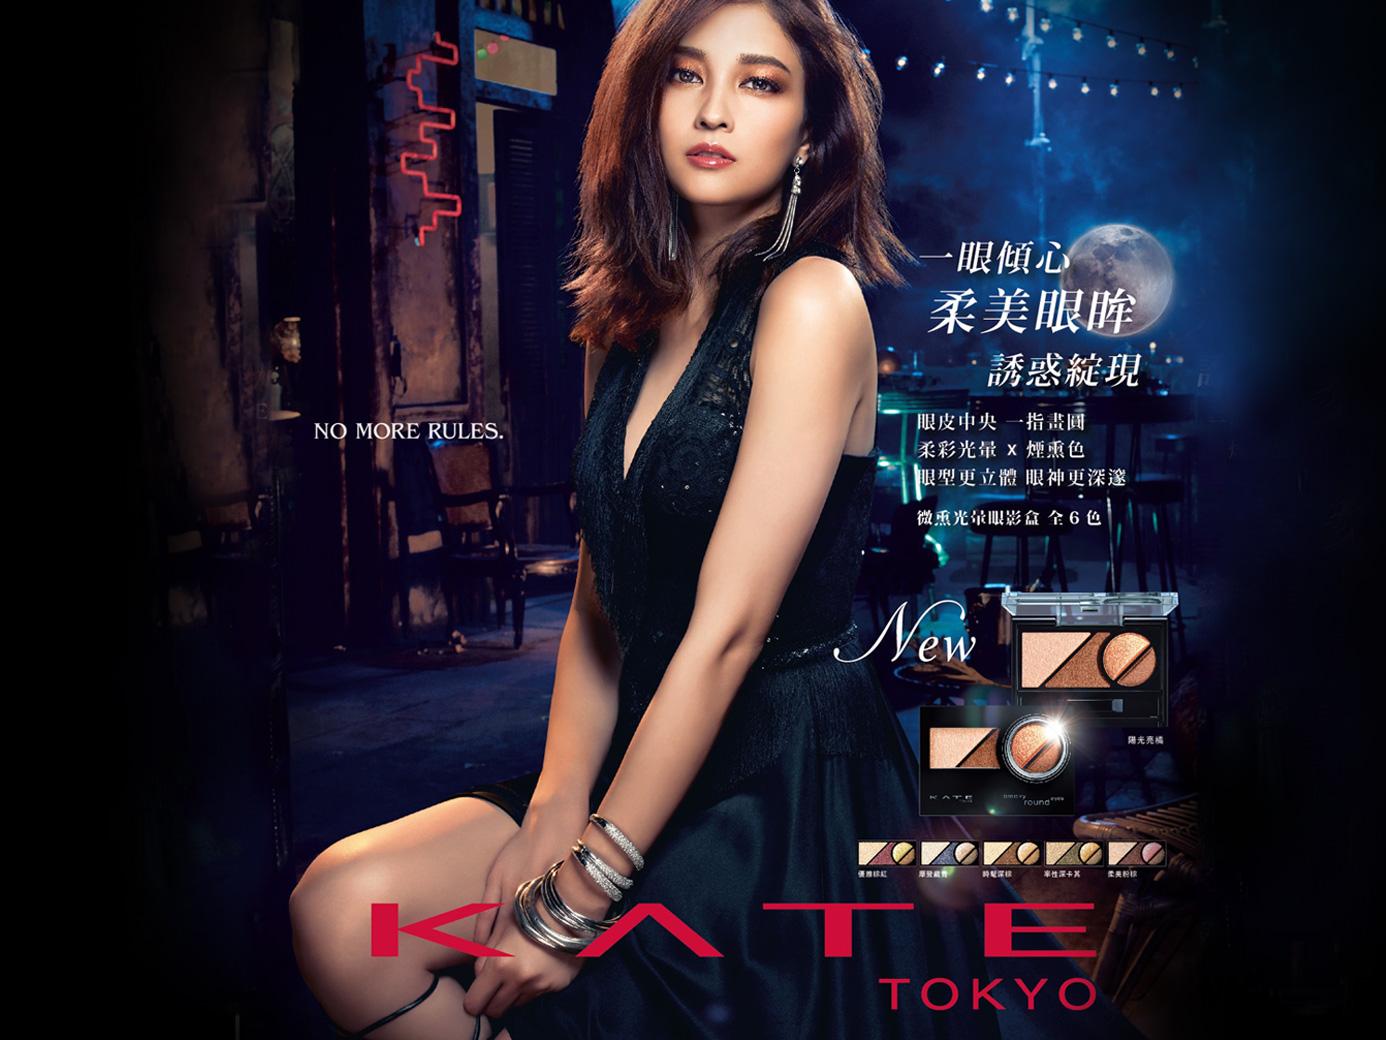 KATE微熏光暈眼影盒,一指畫圓打造專屬亞洲女孩的「柔彩光暈眼」